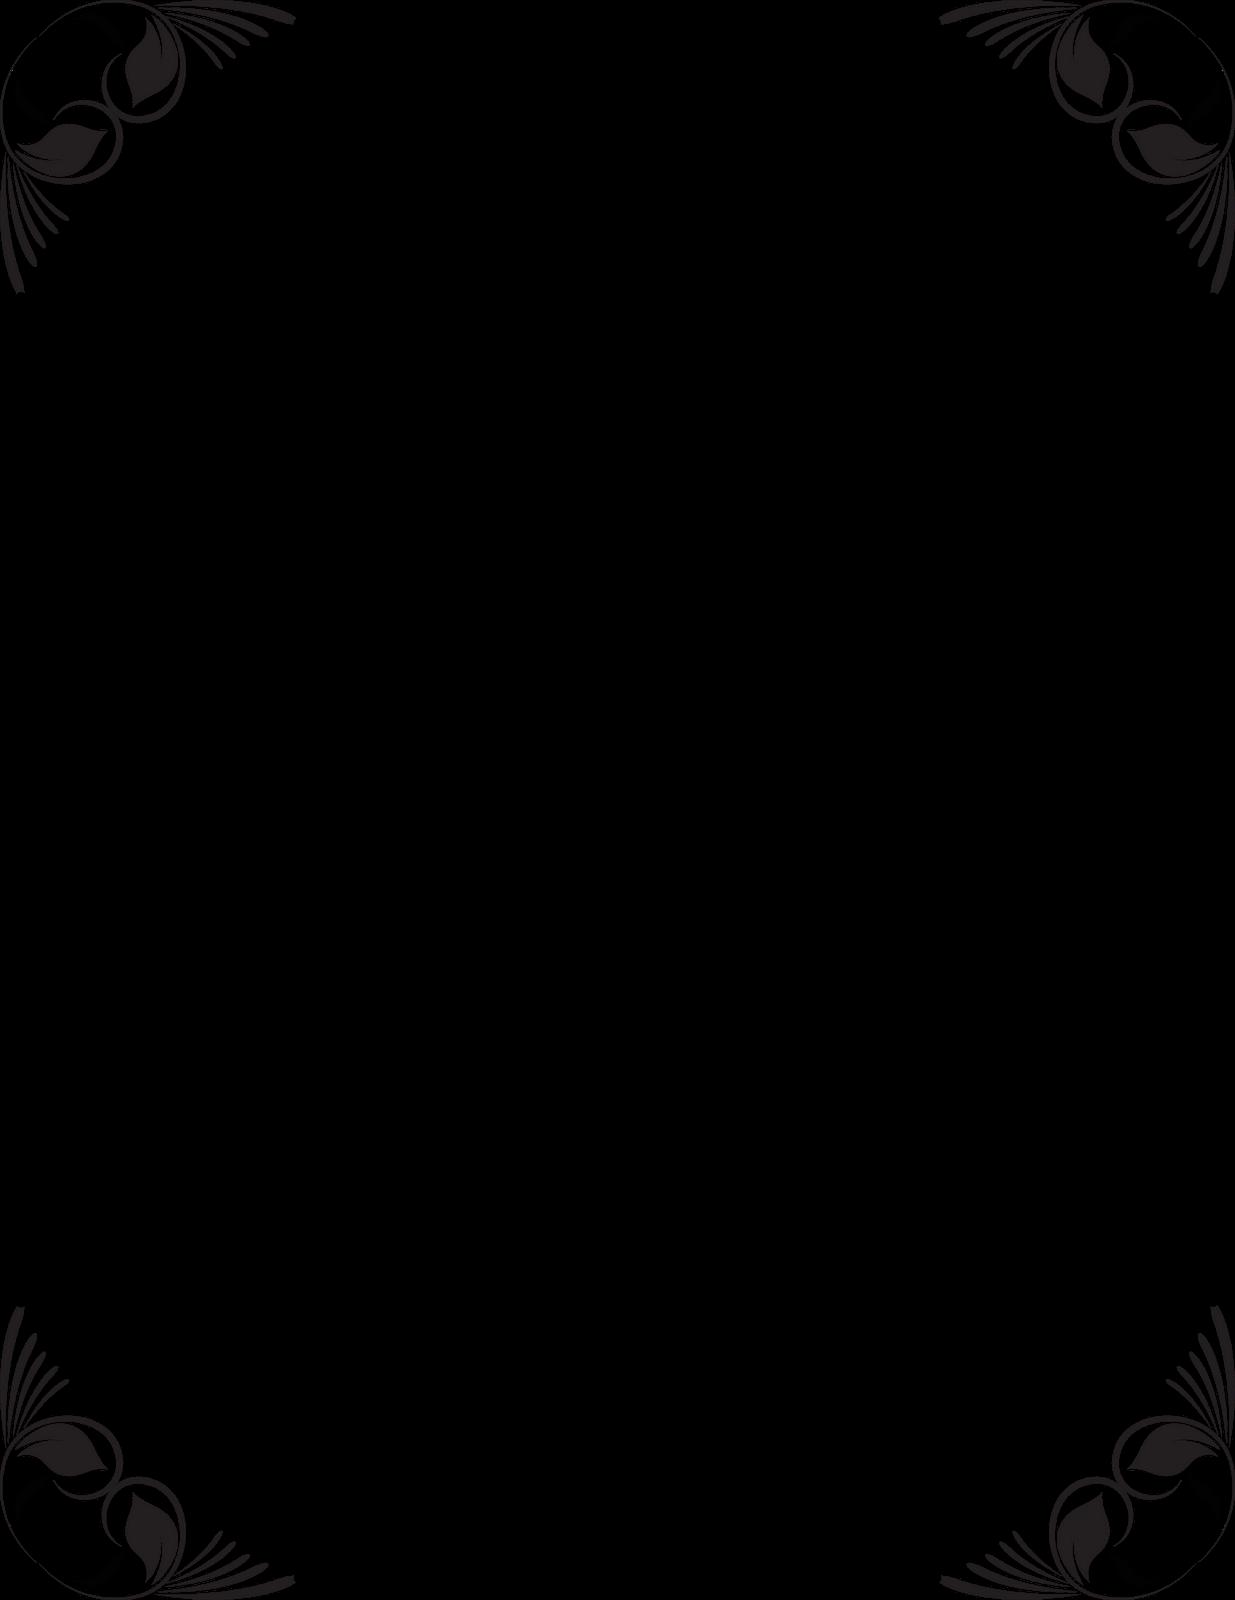 Download free coreldraw tutorials vector design for Frame designs